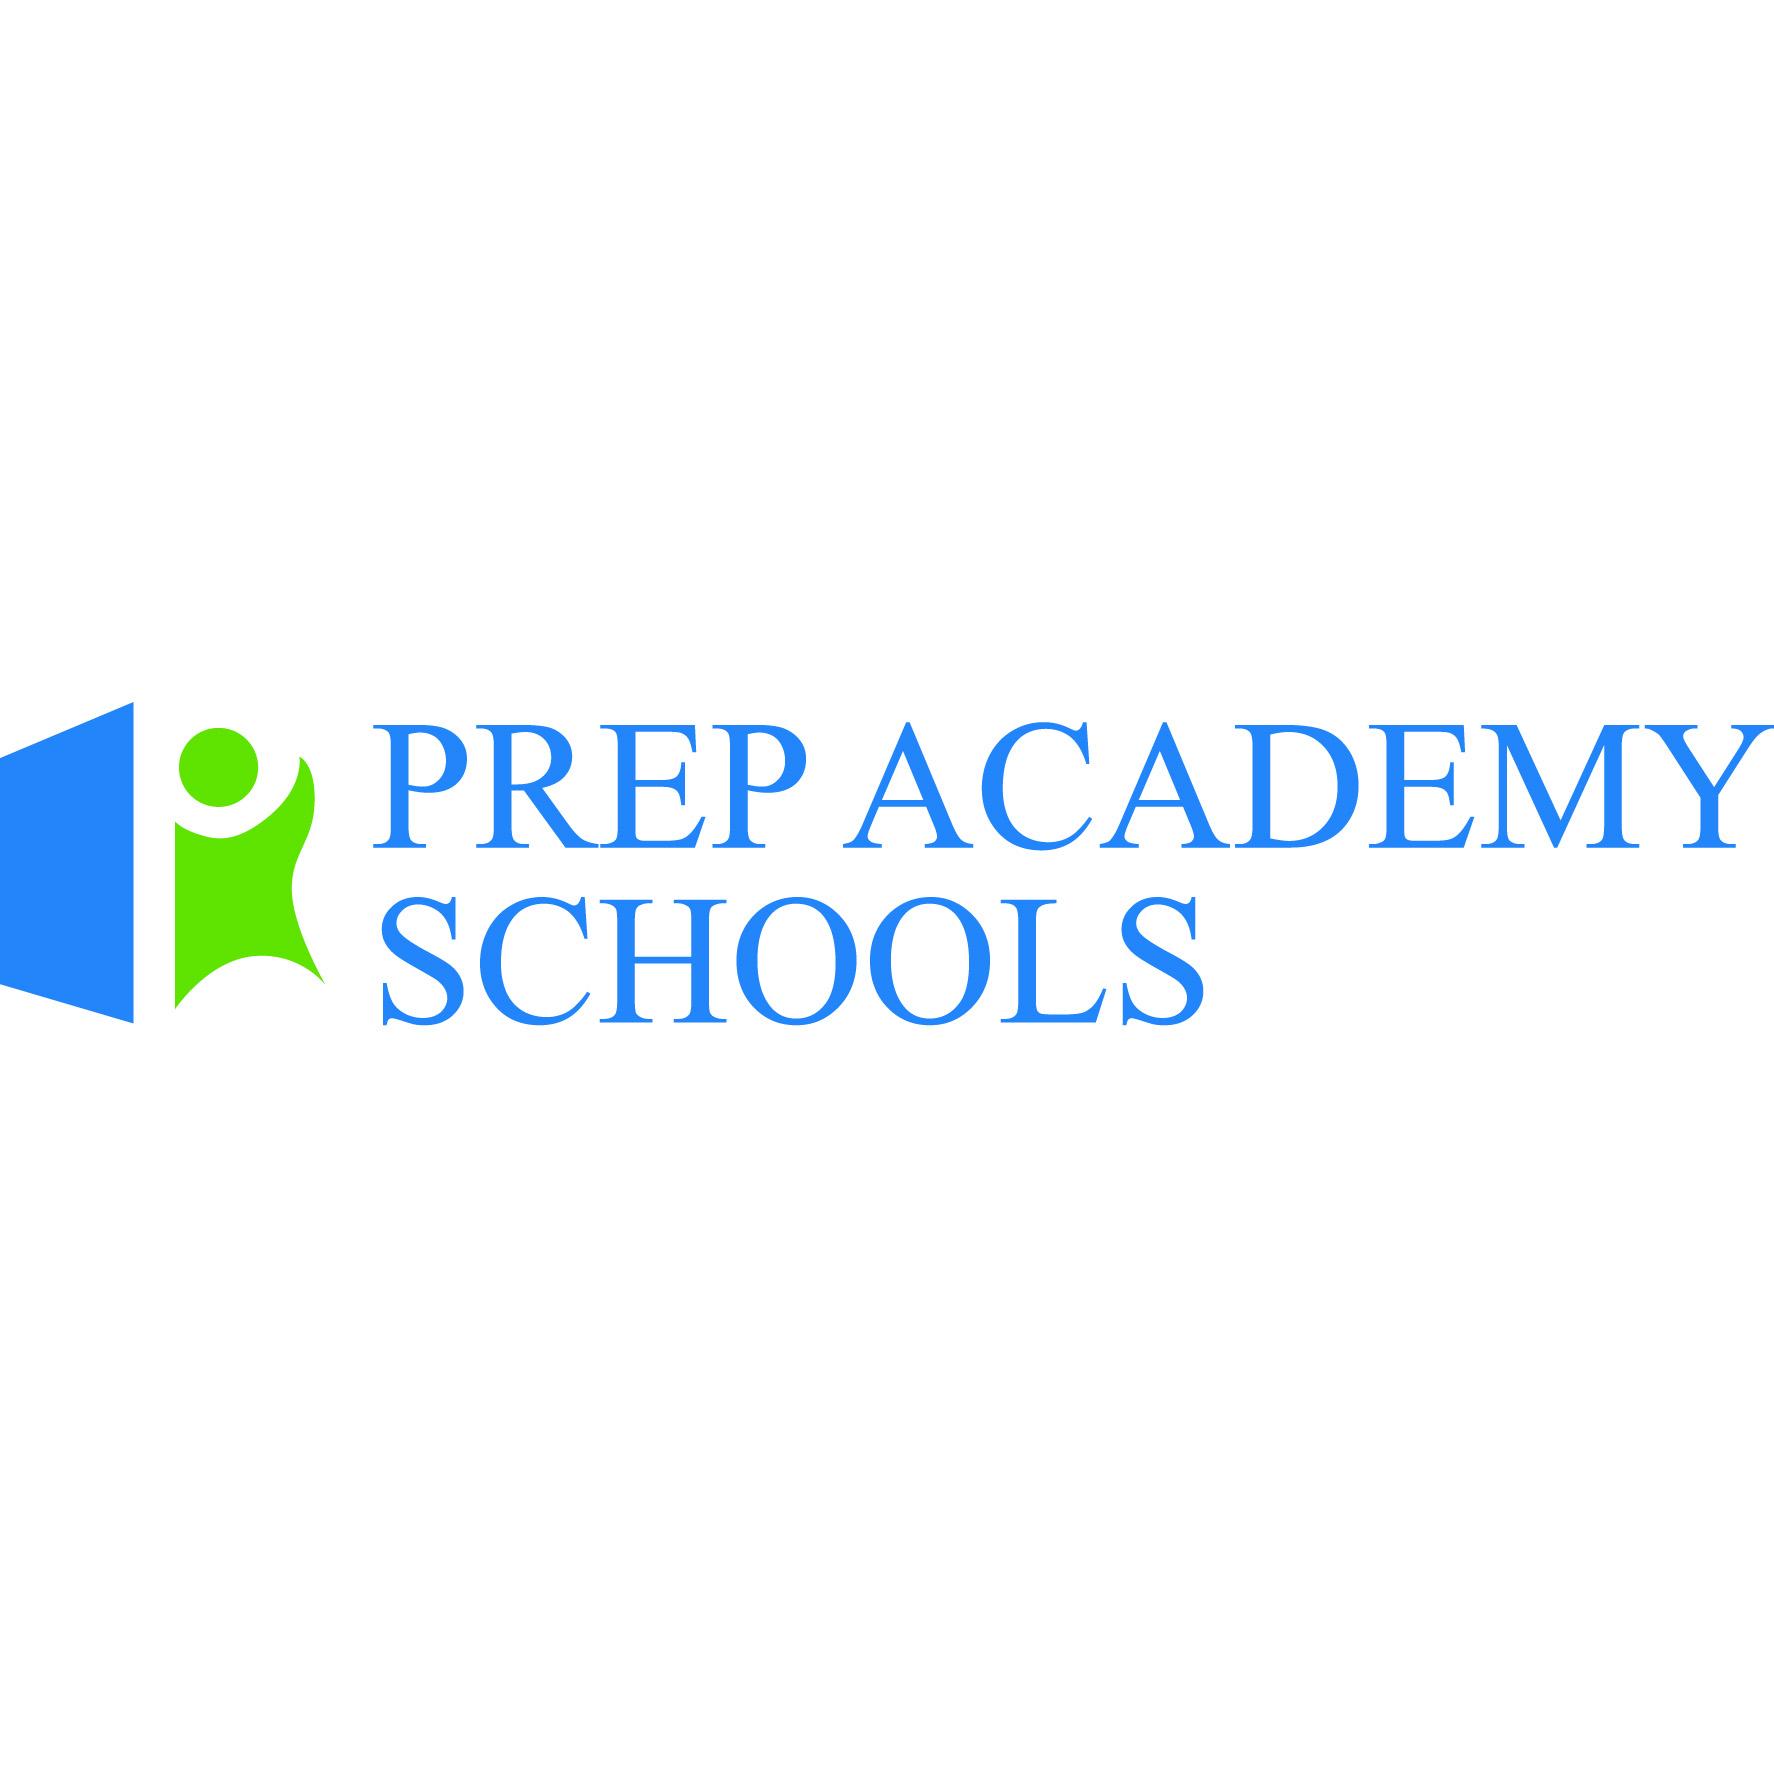 Prep Academy Schools